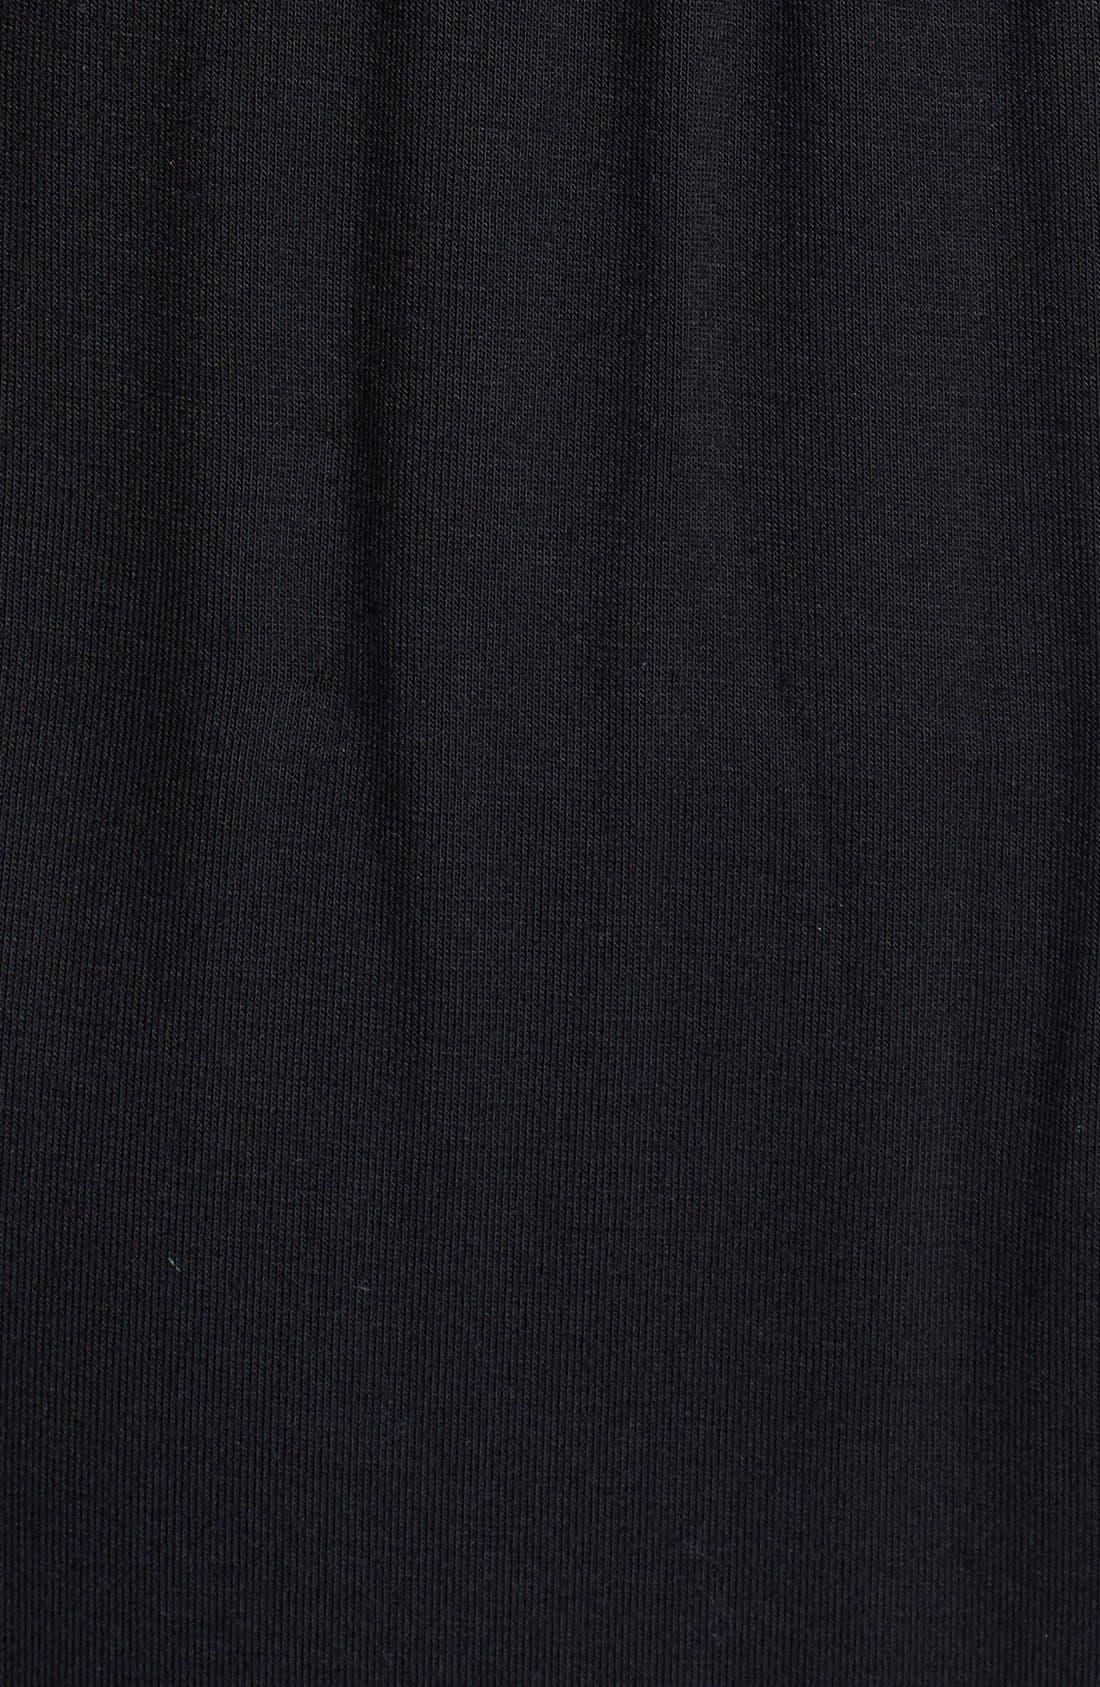 Drawstring Jersey Maxi Dress,                             Alternate thumbnail 3, color,                             001